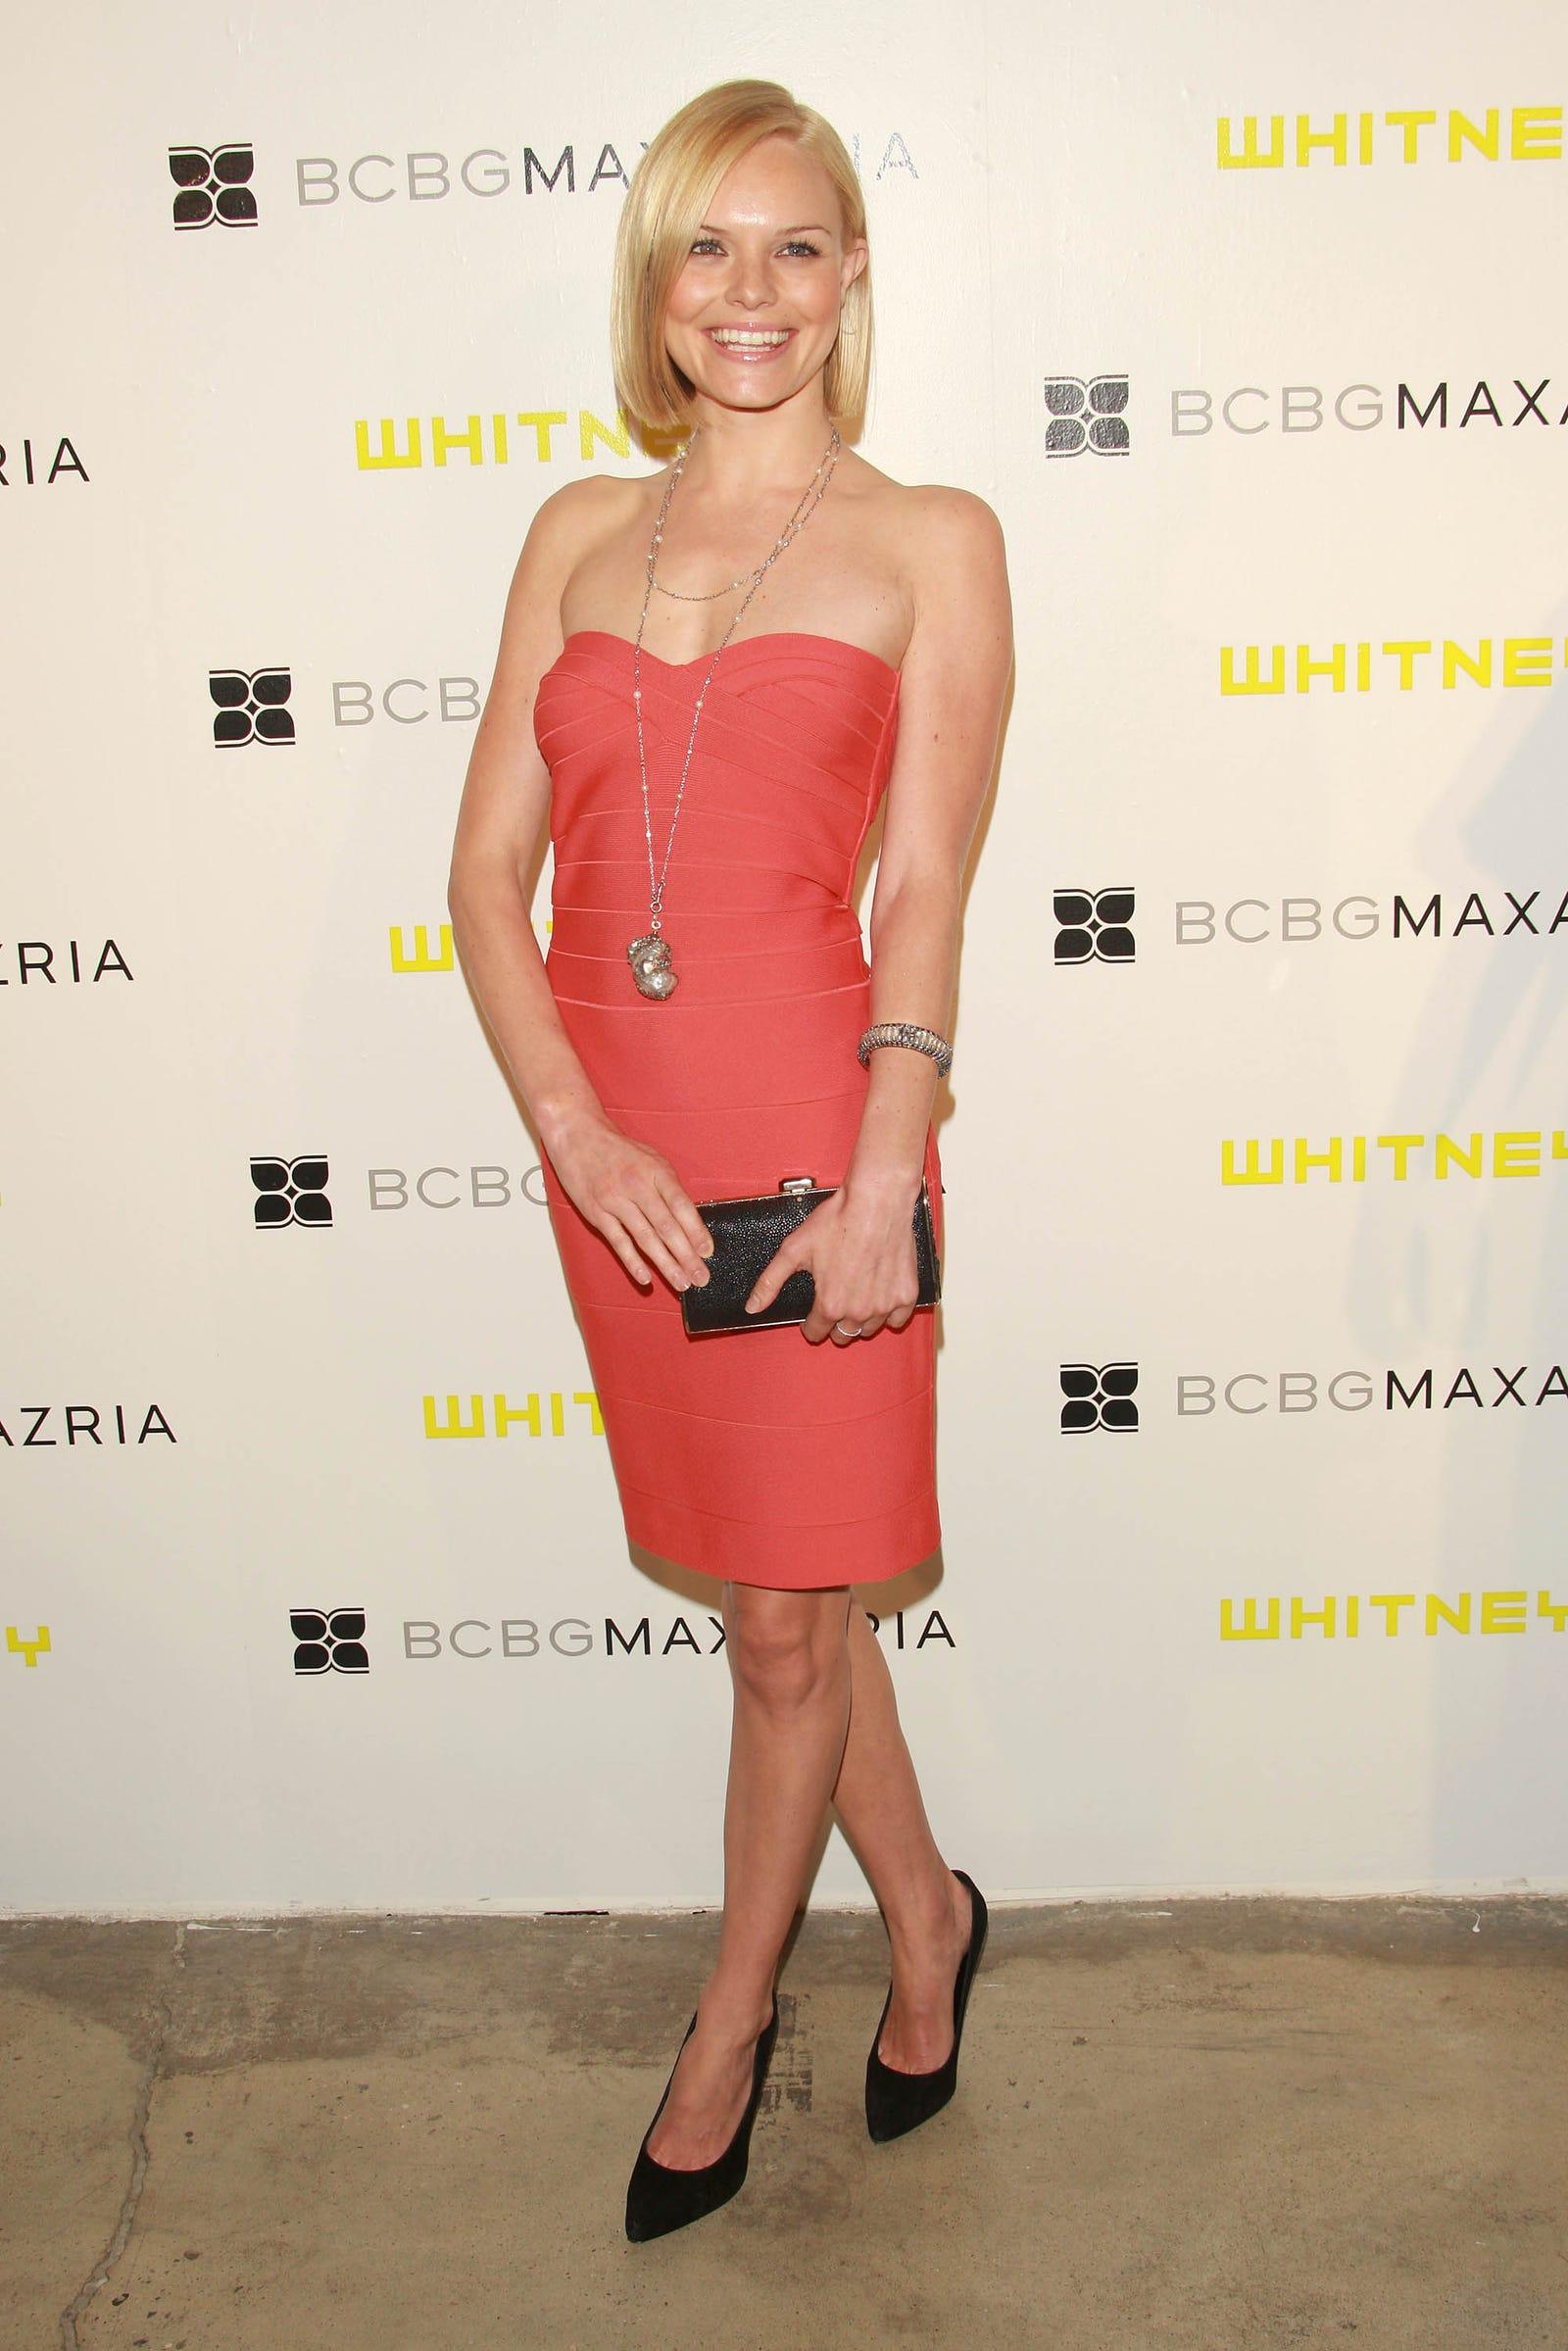 Kate Bosworth at a 2007 BCBG Max Azria fashion show / Image via Getty